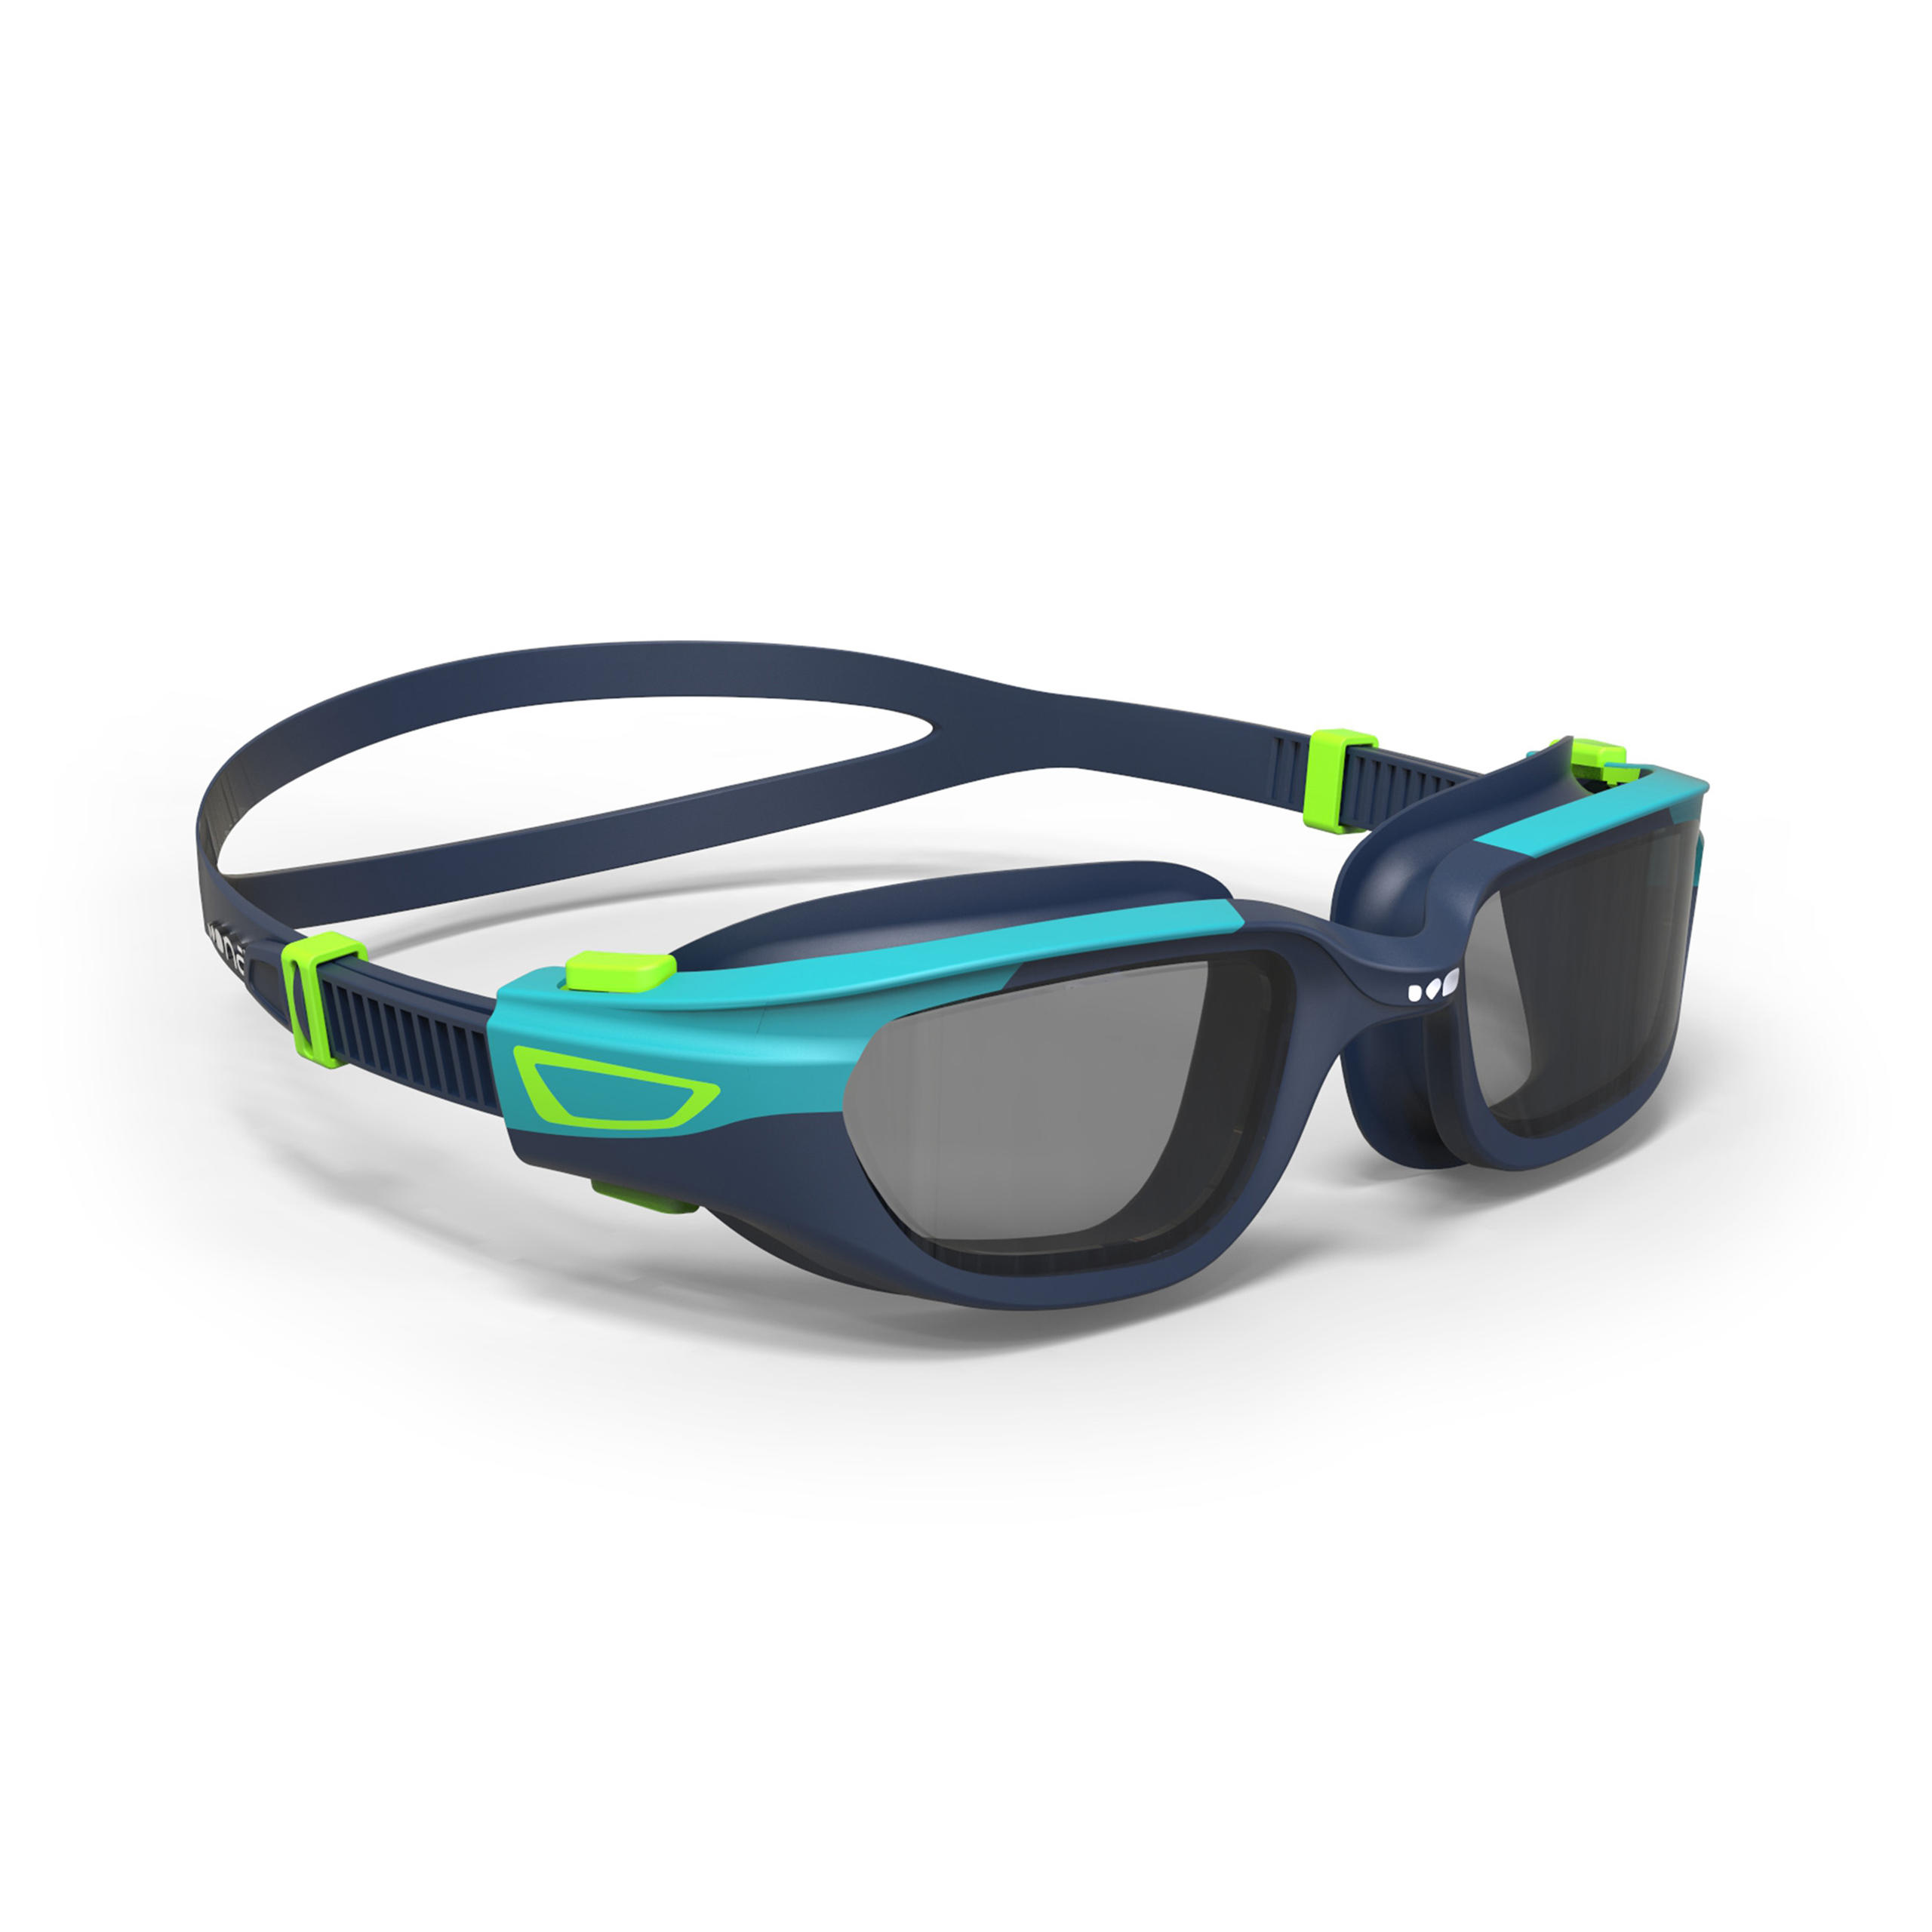 Goggles SPIRIT talla CH azul y verde